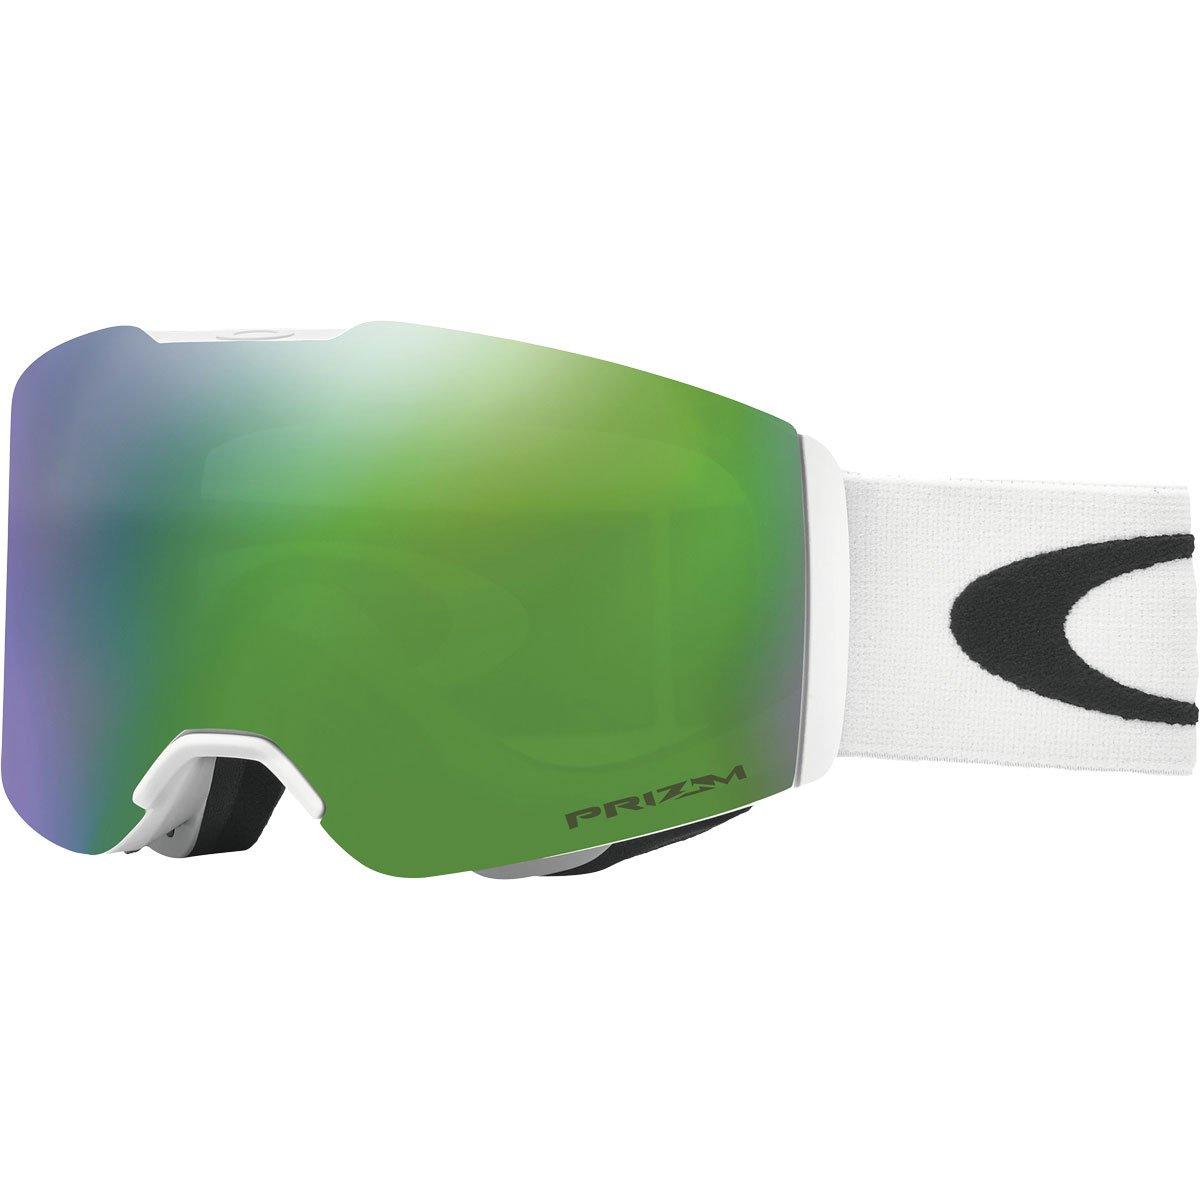 Oakley Fall Line Snow Goggles, Matte White Frame, Prizm Jade Iridium Lens, Medium by Oakley